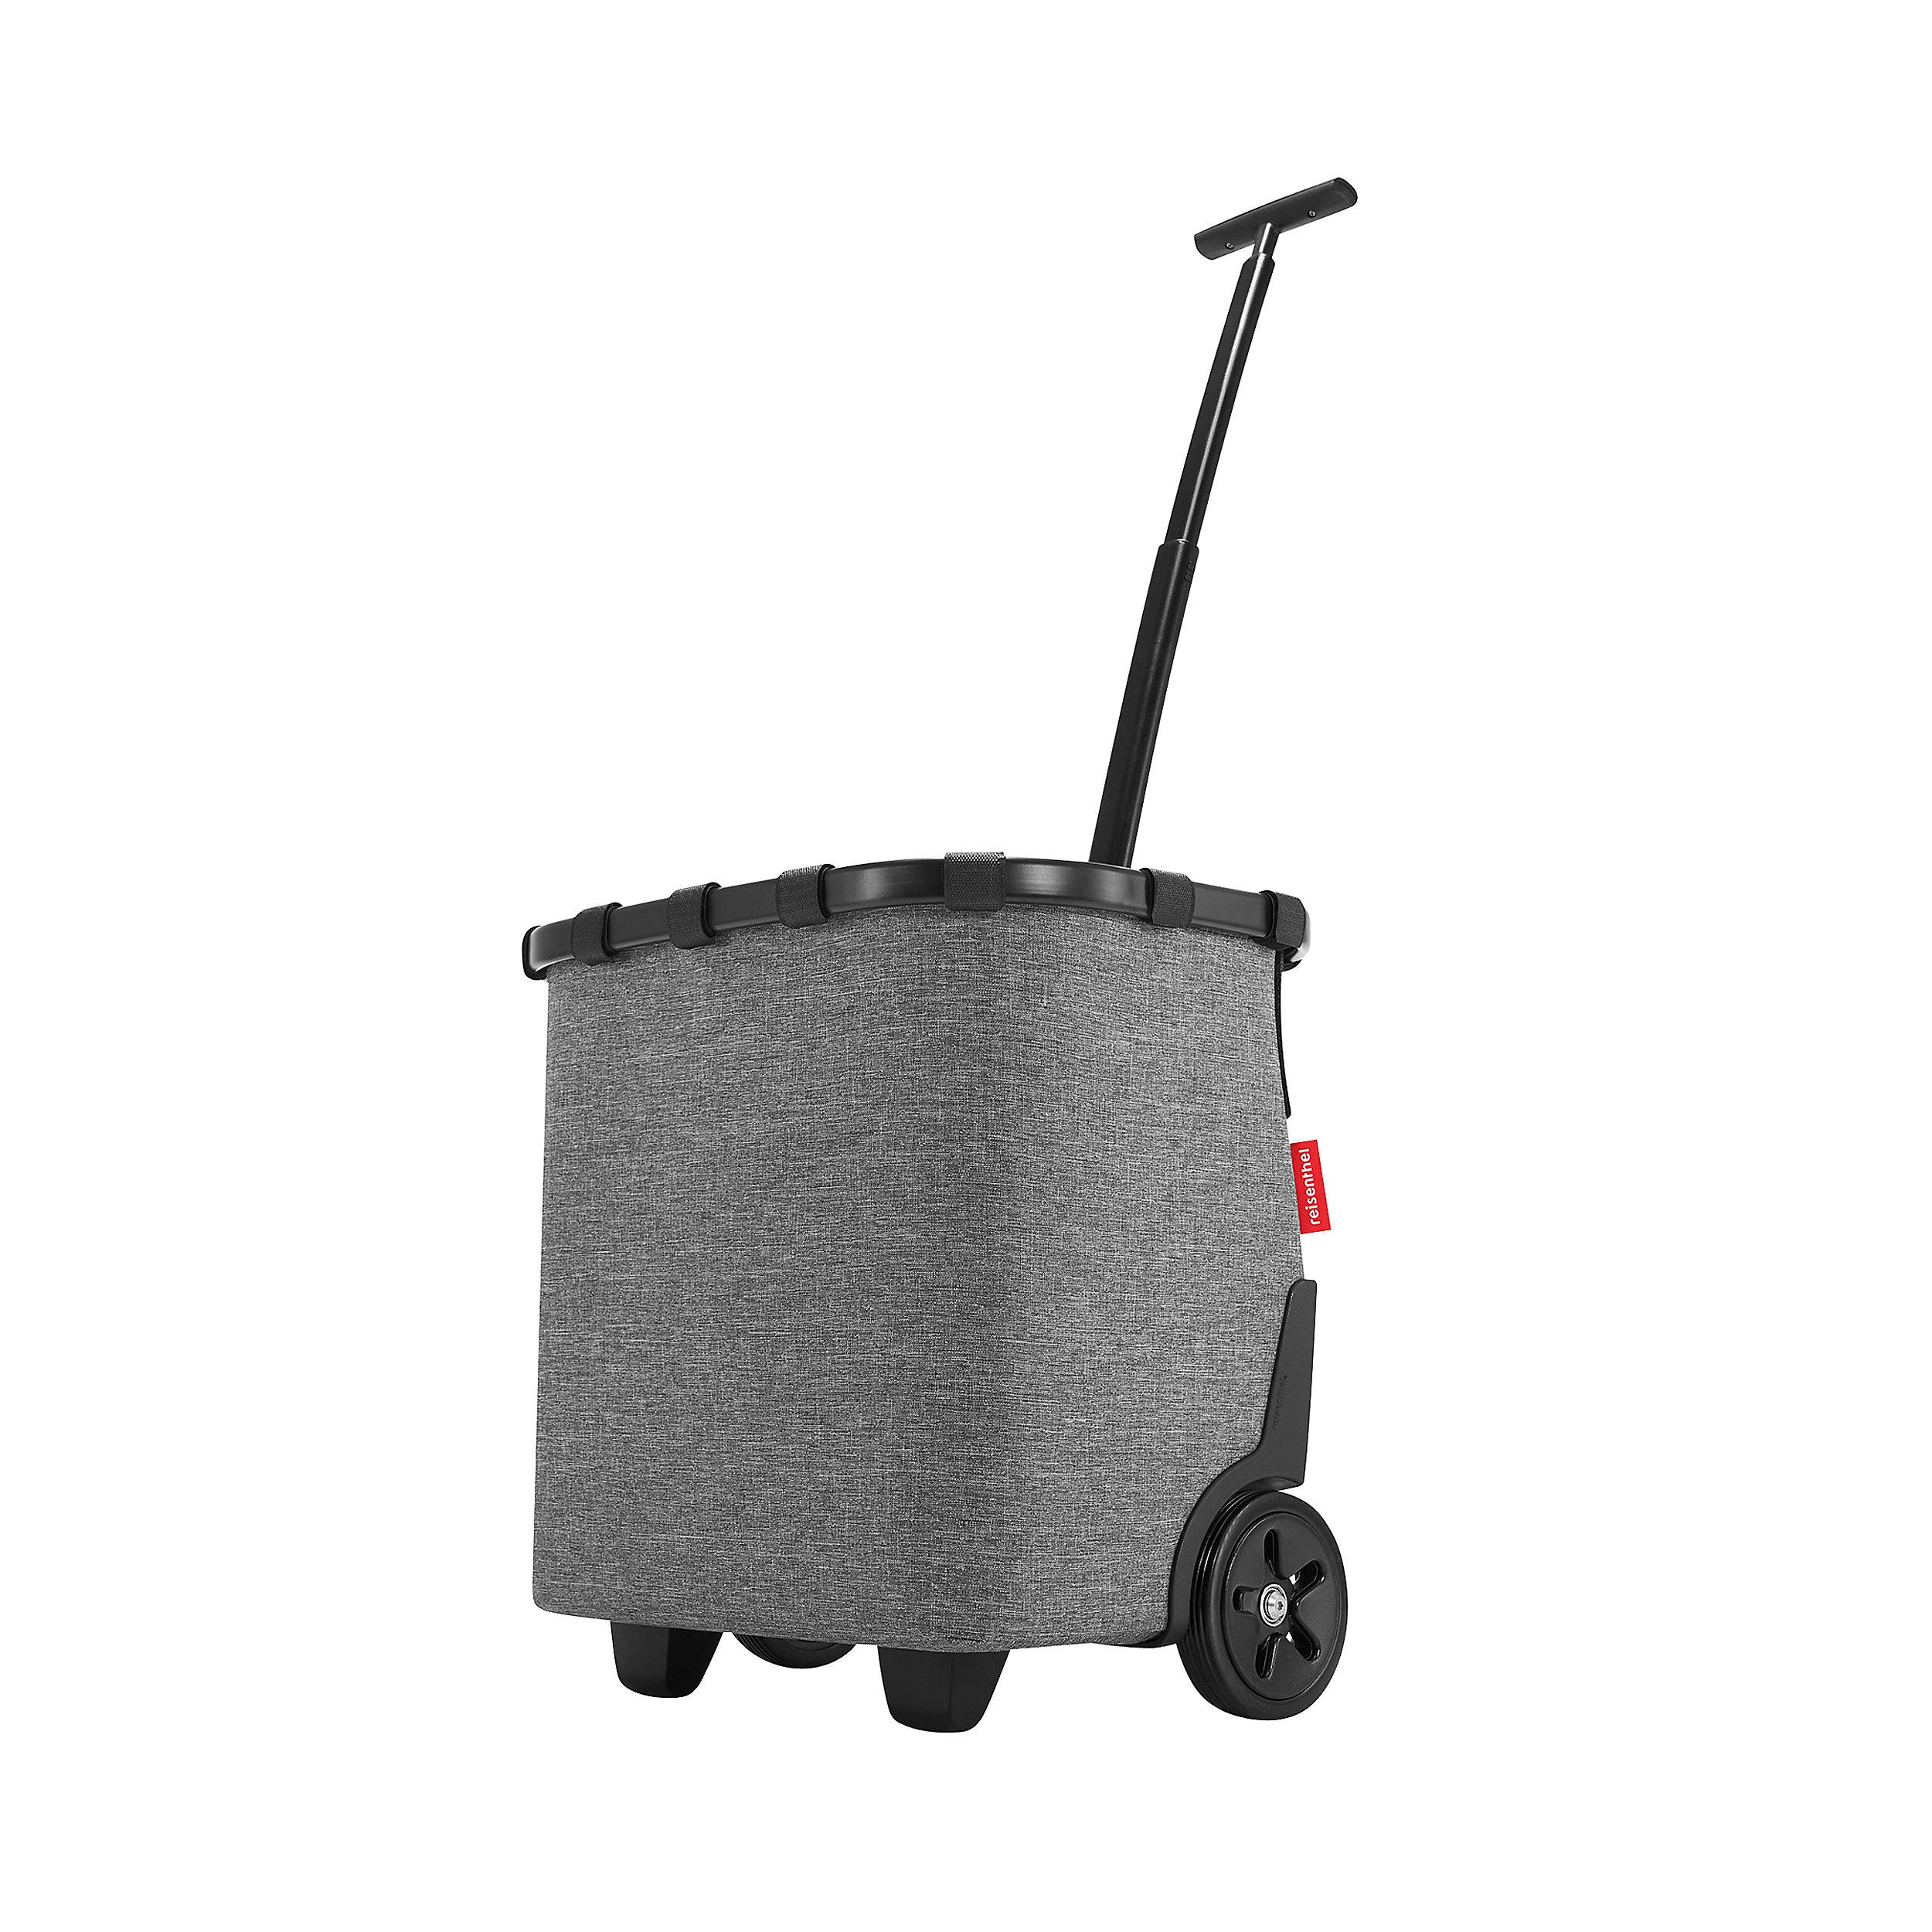 Carrycruiser with 2 wheels Frame Twist Shopping 40 Liter